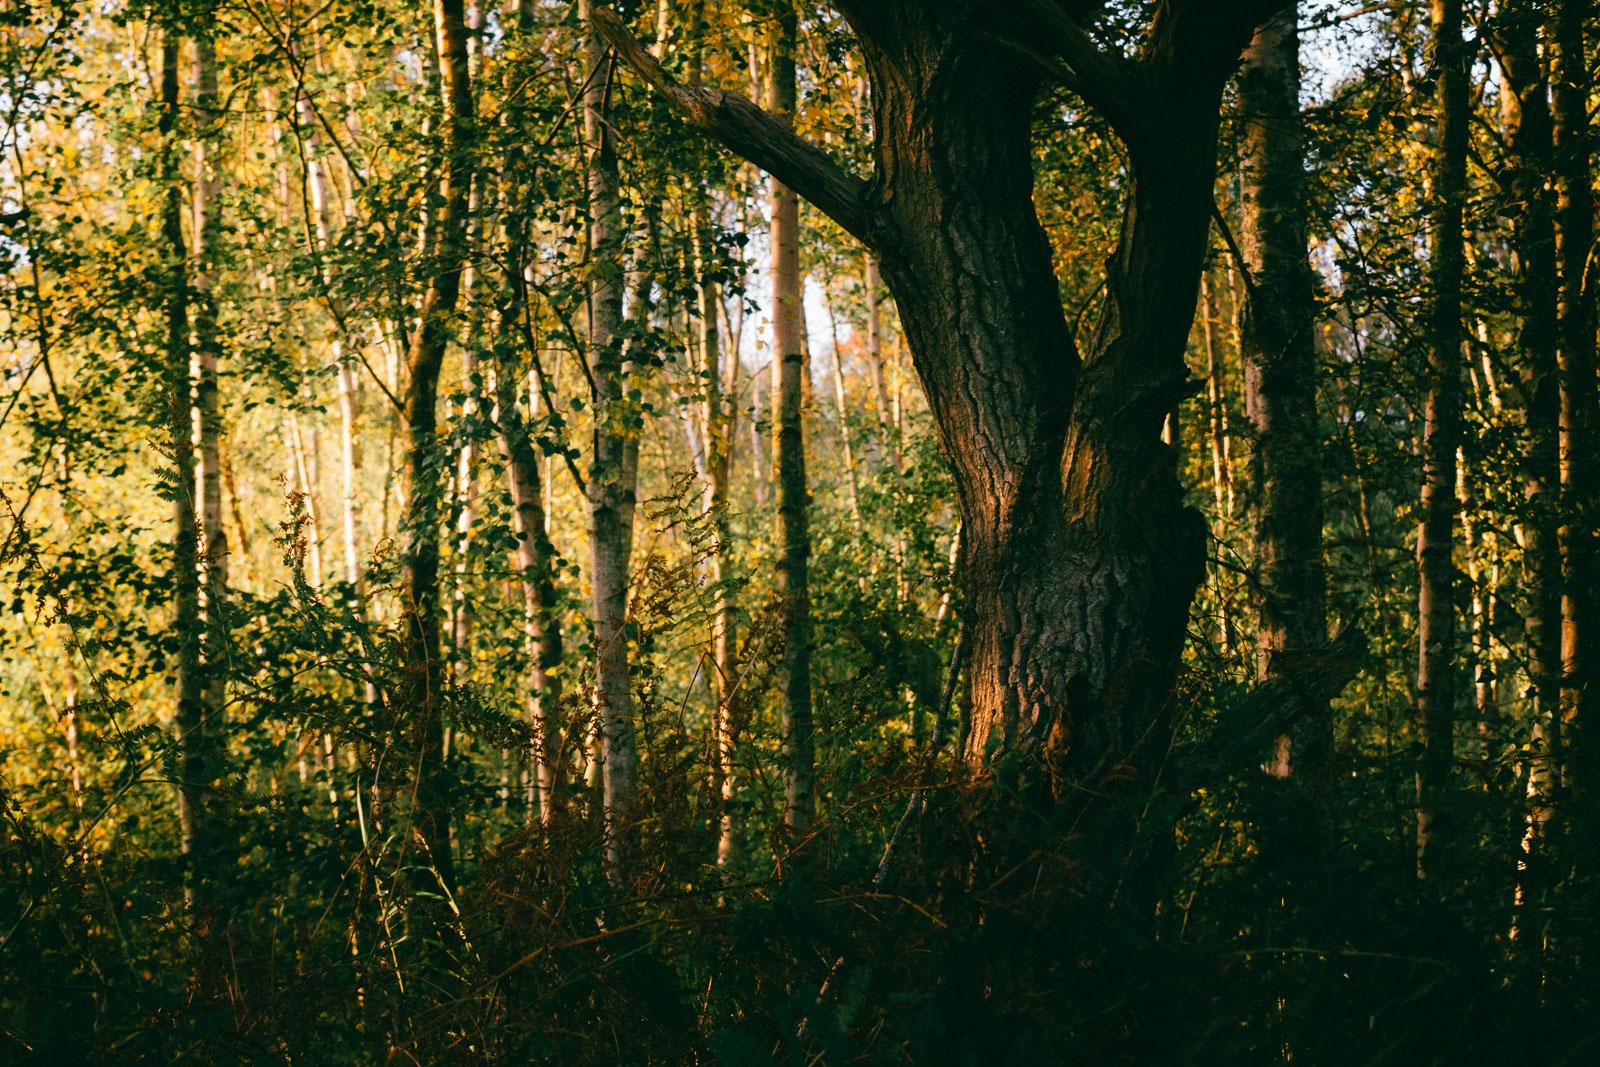 Tree Trunk at Holme Fen